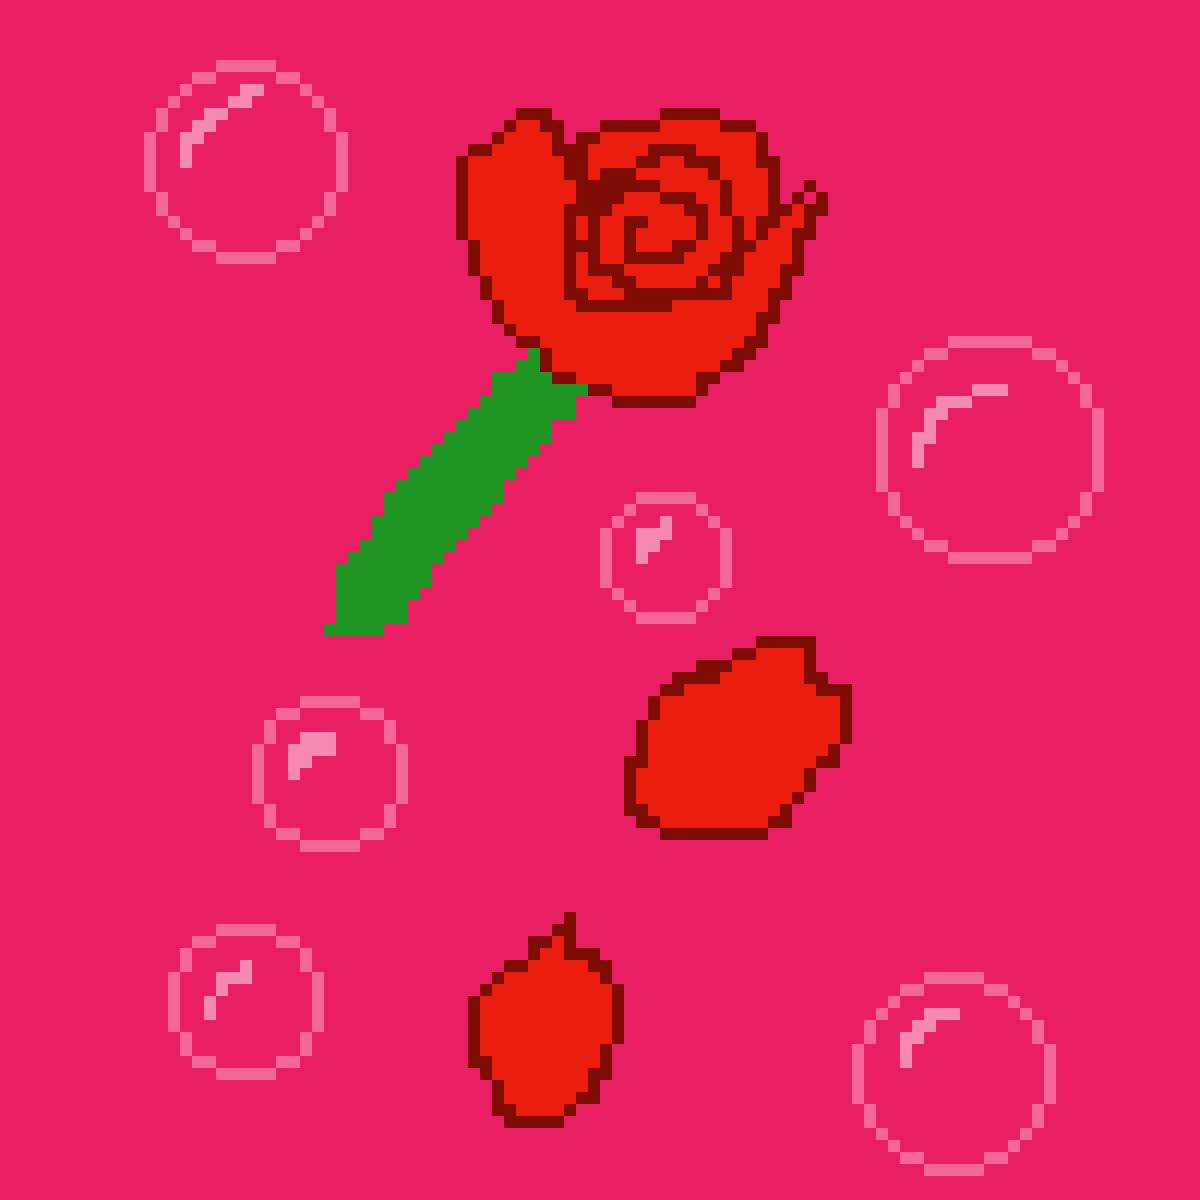 happy valentines day by Evil-dorrito